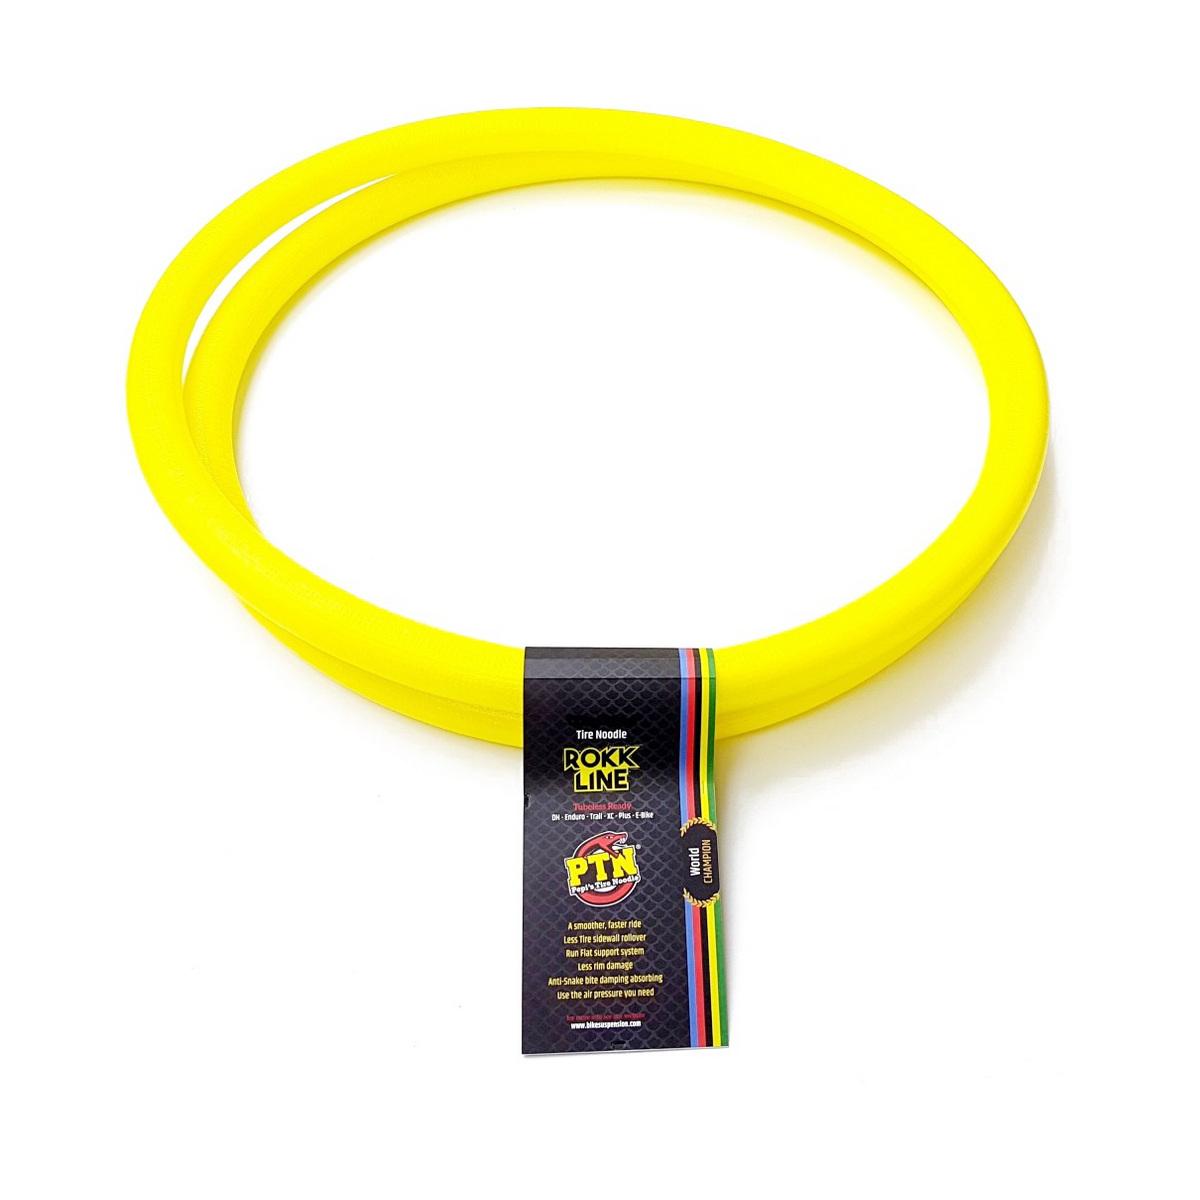 Rokkline tubeless internal puncture protection 29''-27.5'' mullet  size M/M